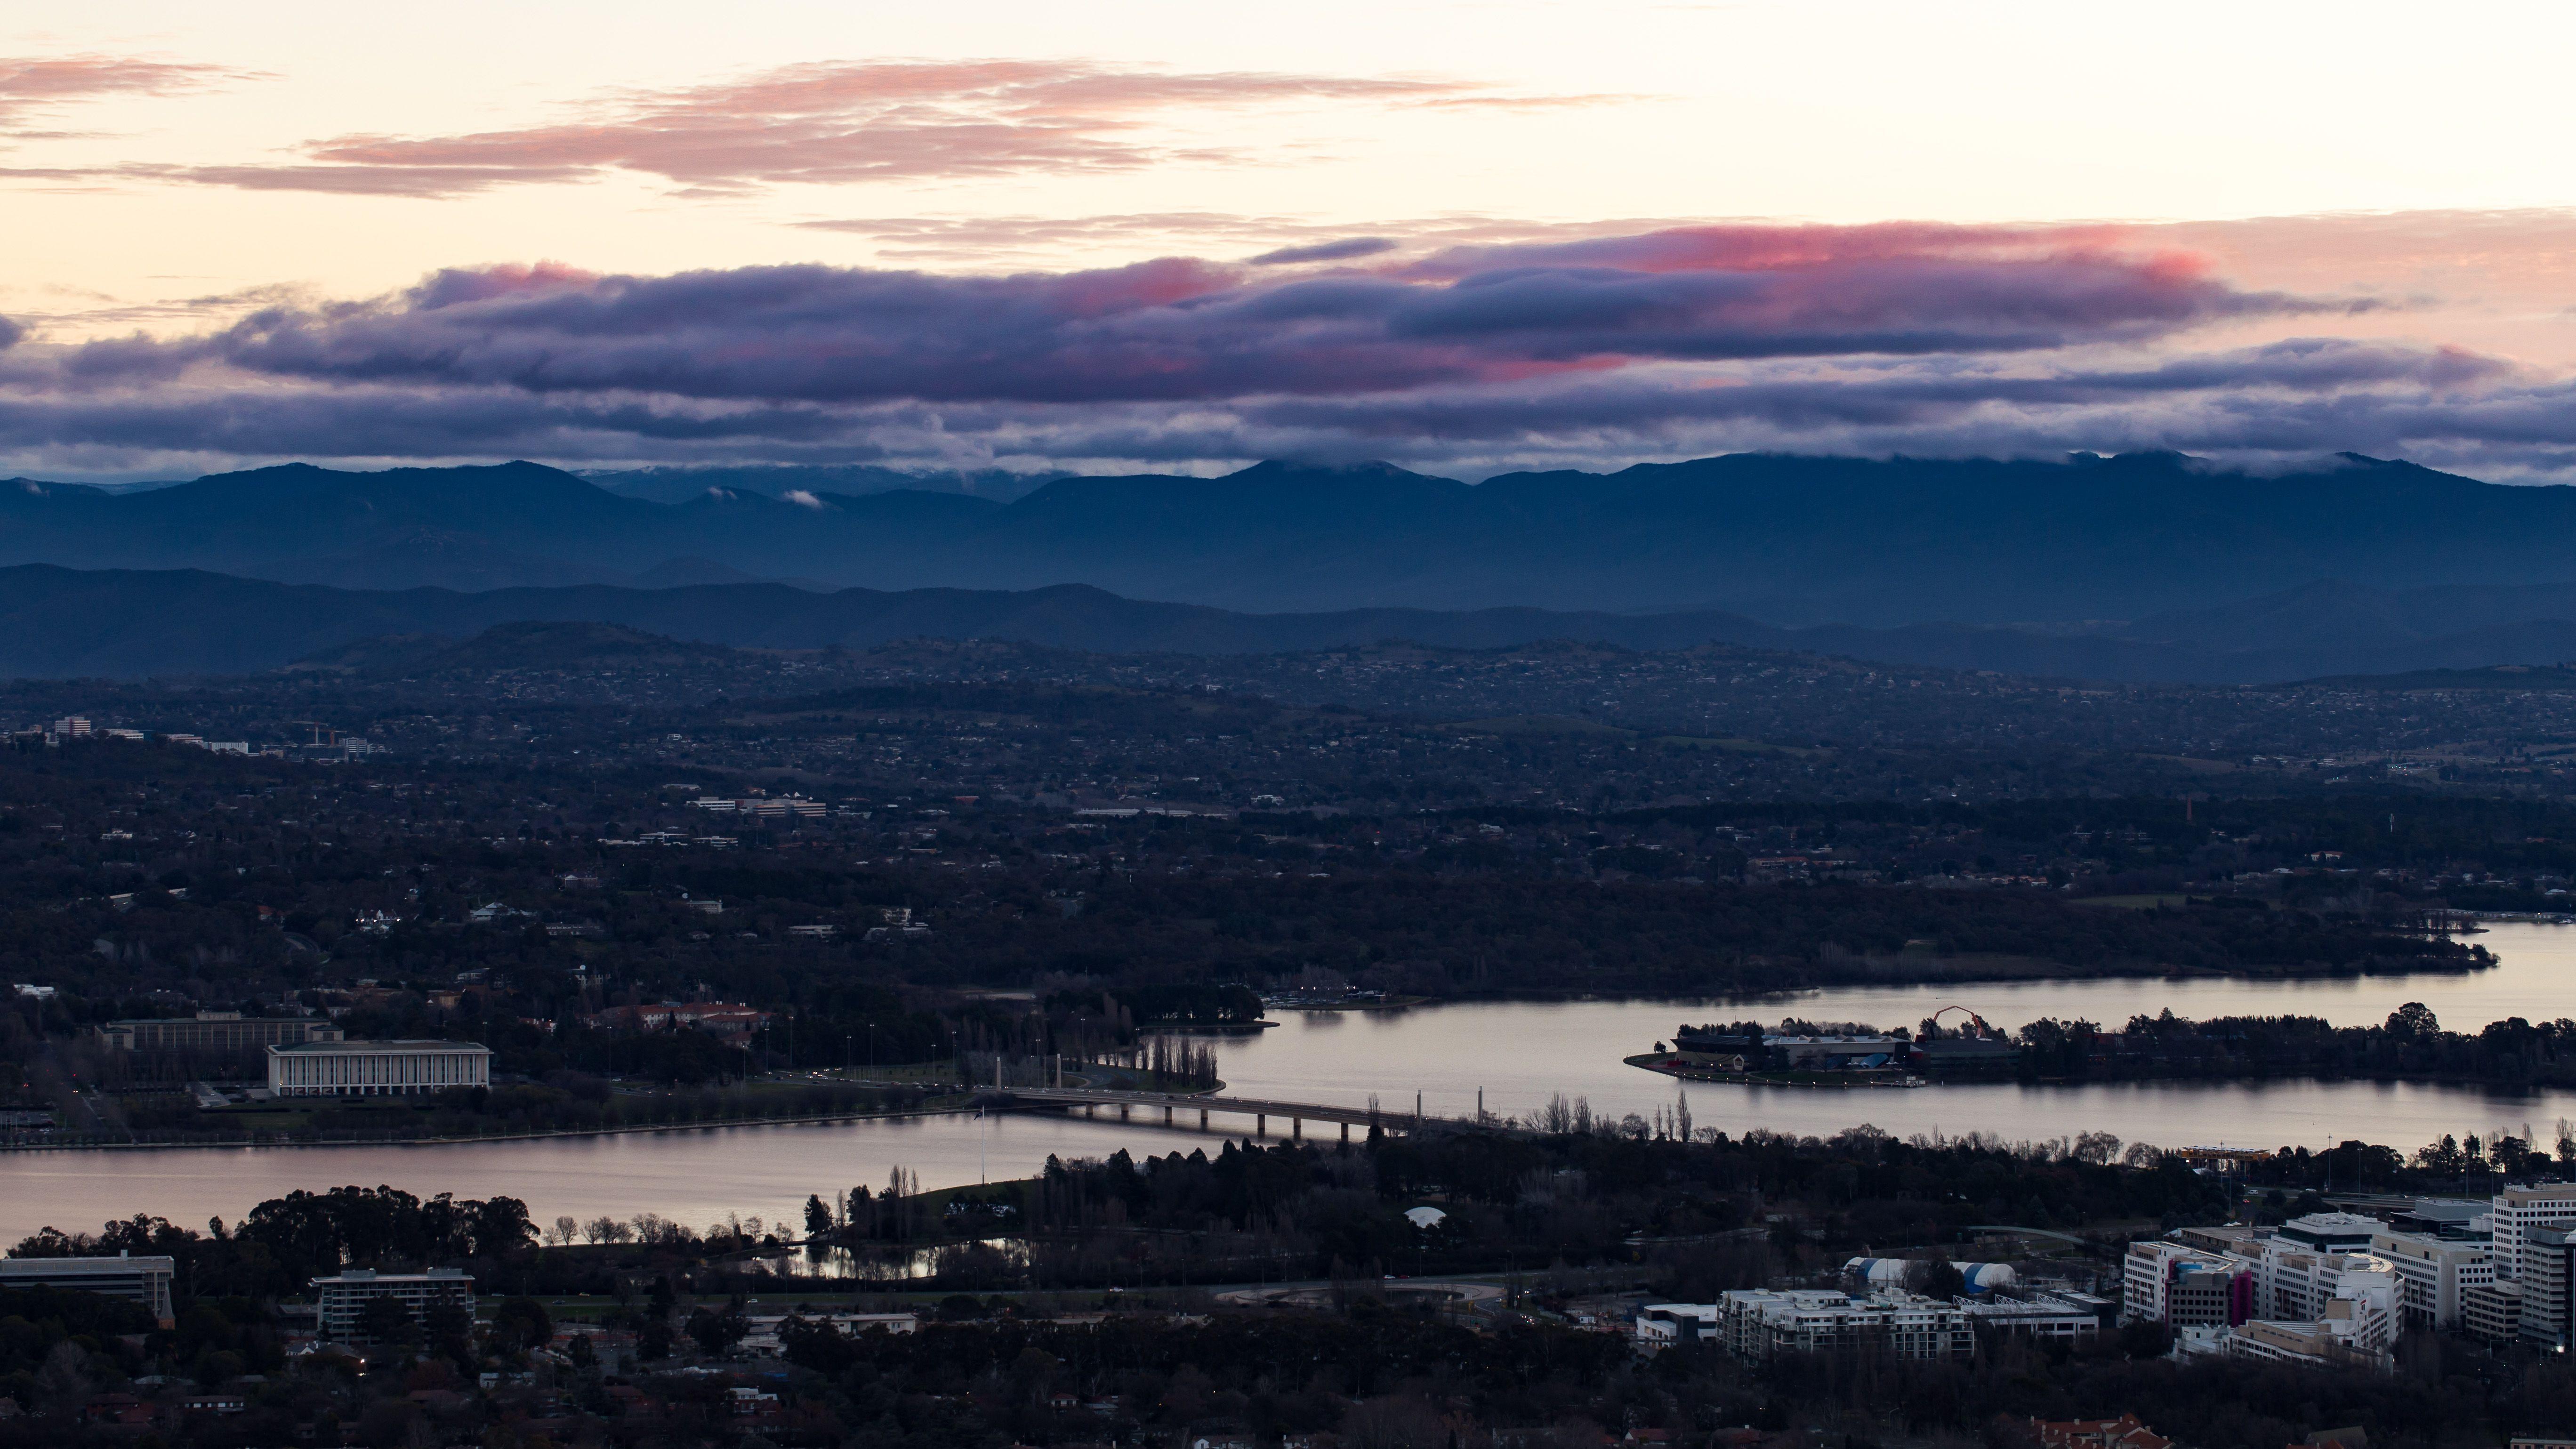 L2m2ap1 Hdr Cityscape Sunset Canon Eos 6d 100mm F5 6 Iso 400 Tripod Cityscape Natural Landmarks Landmarks